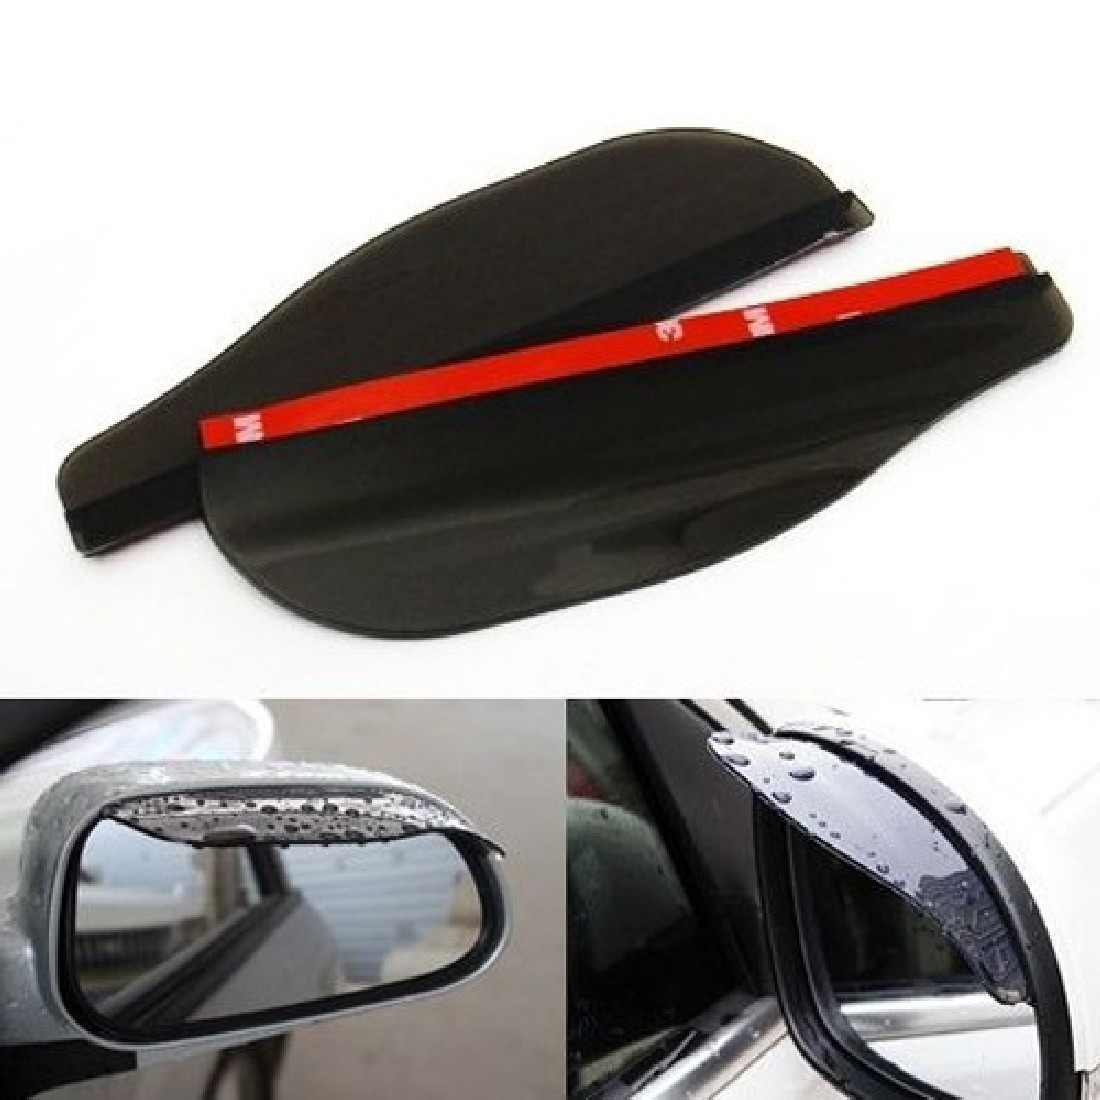 2 Car Rearview Mirror Flexible Anti Rain Shade Auto Weatherstrip Rainproof Cover